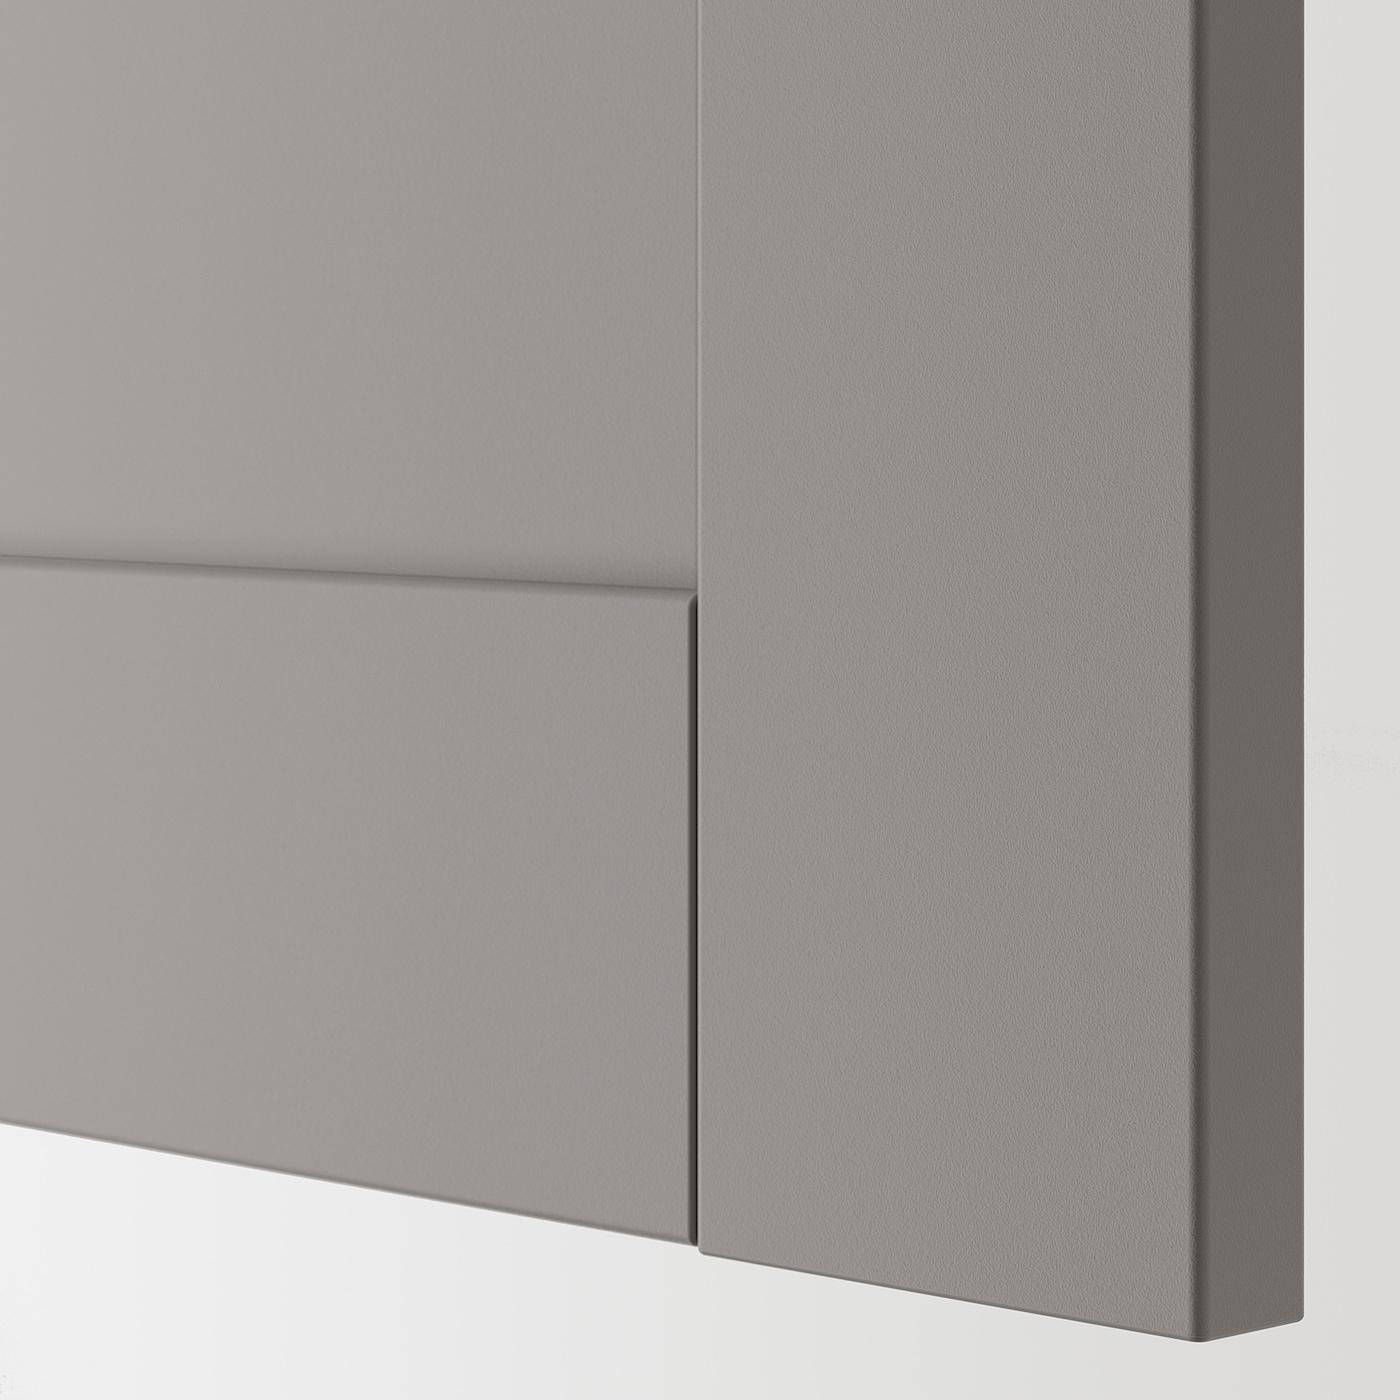 ENHET Drawer front, grey frame, 80x30 cm